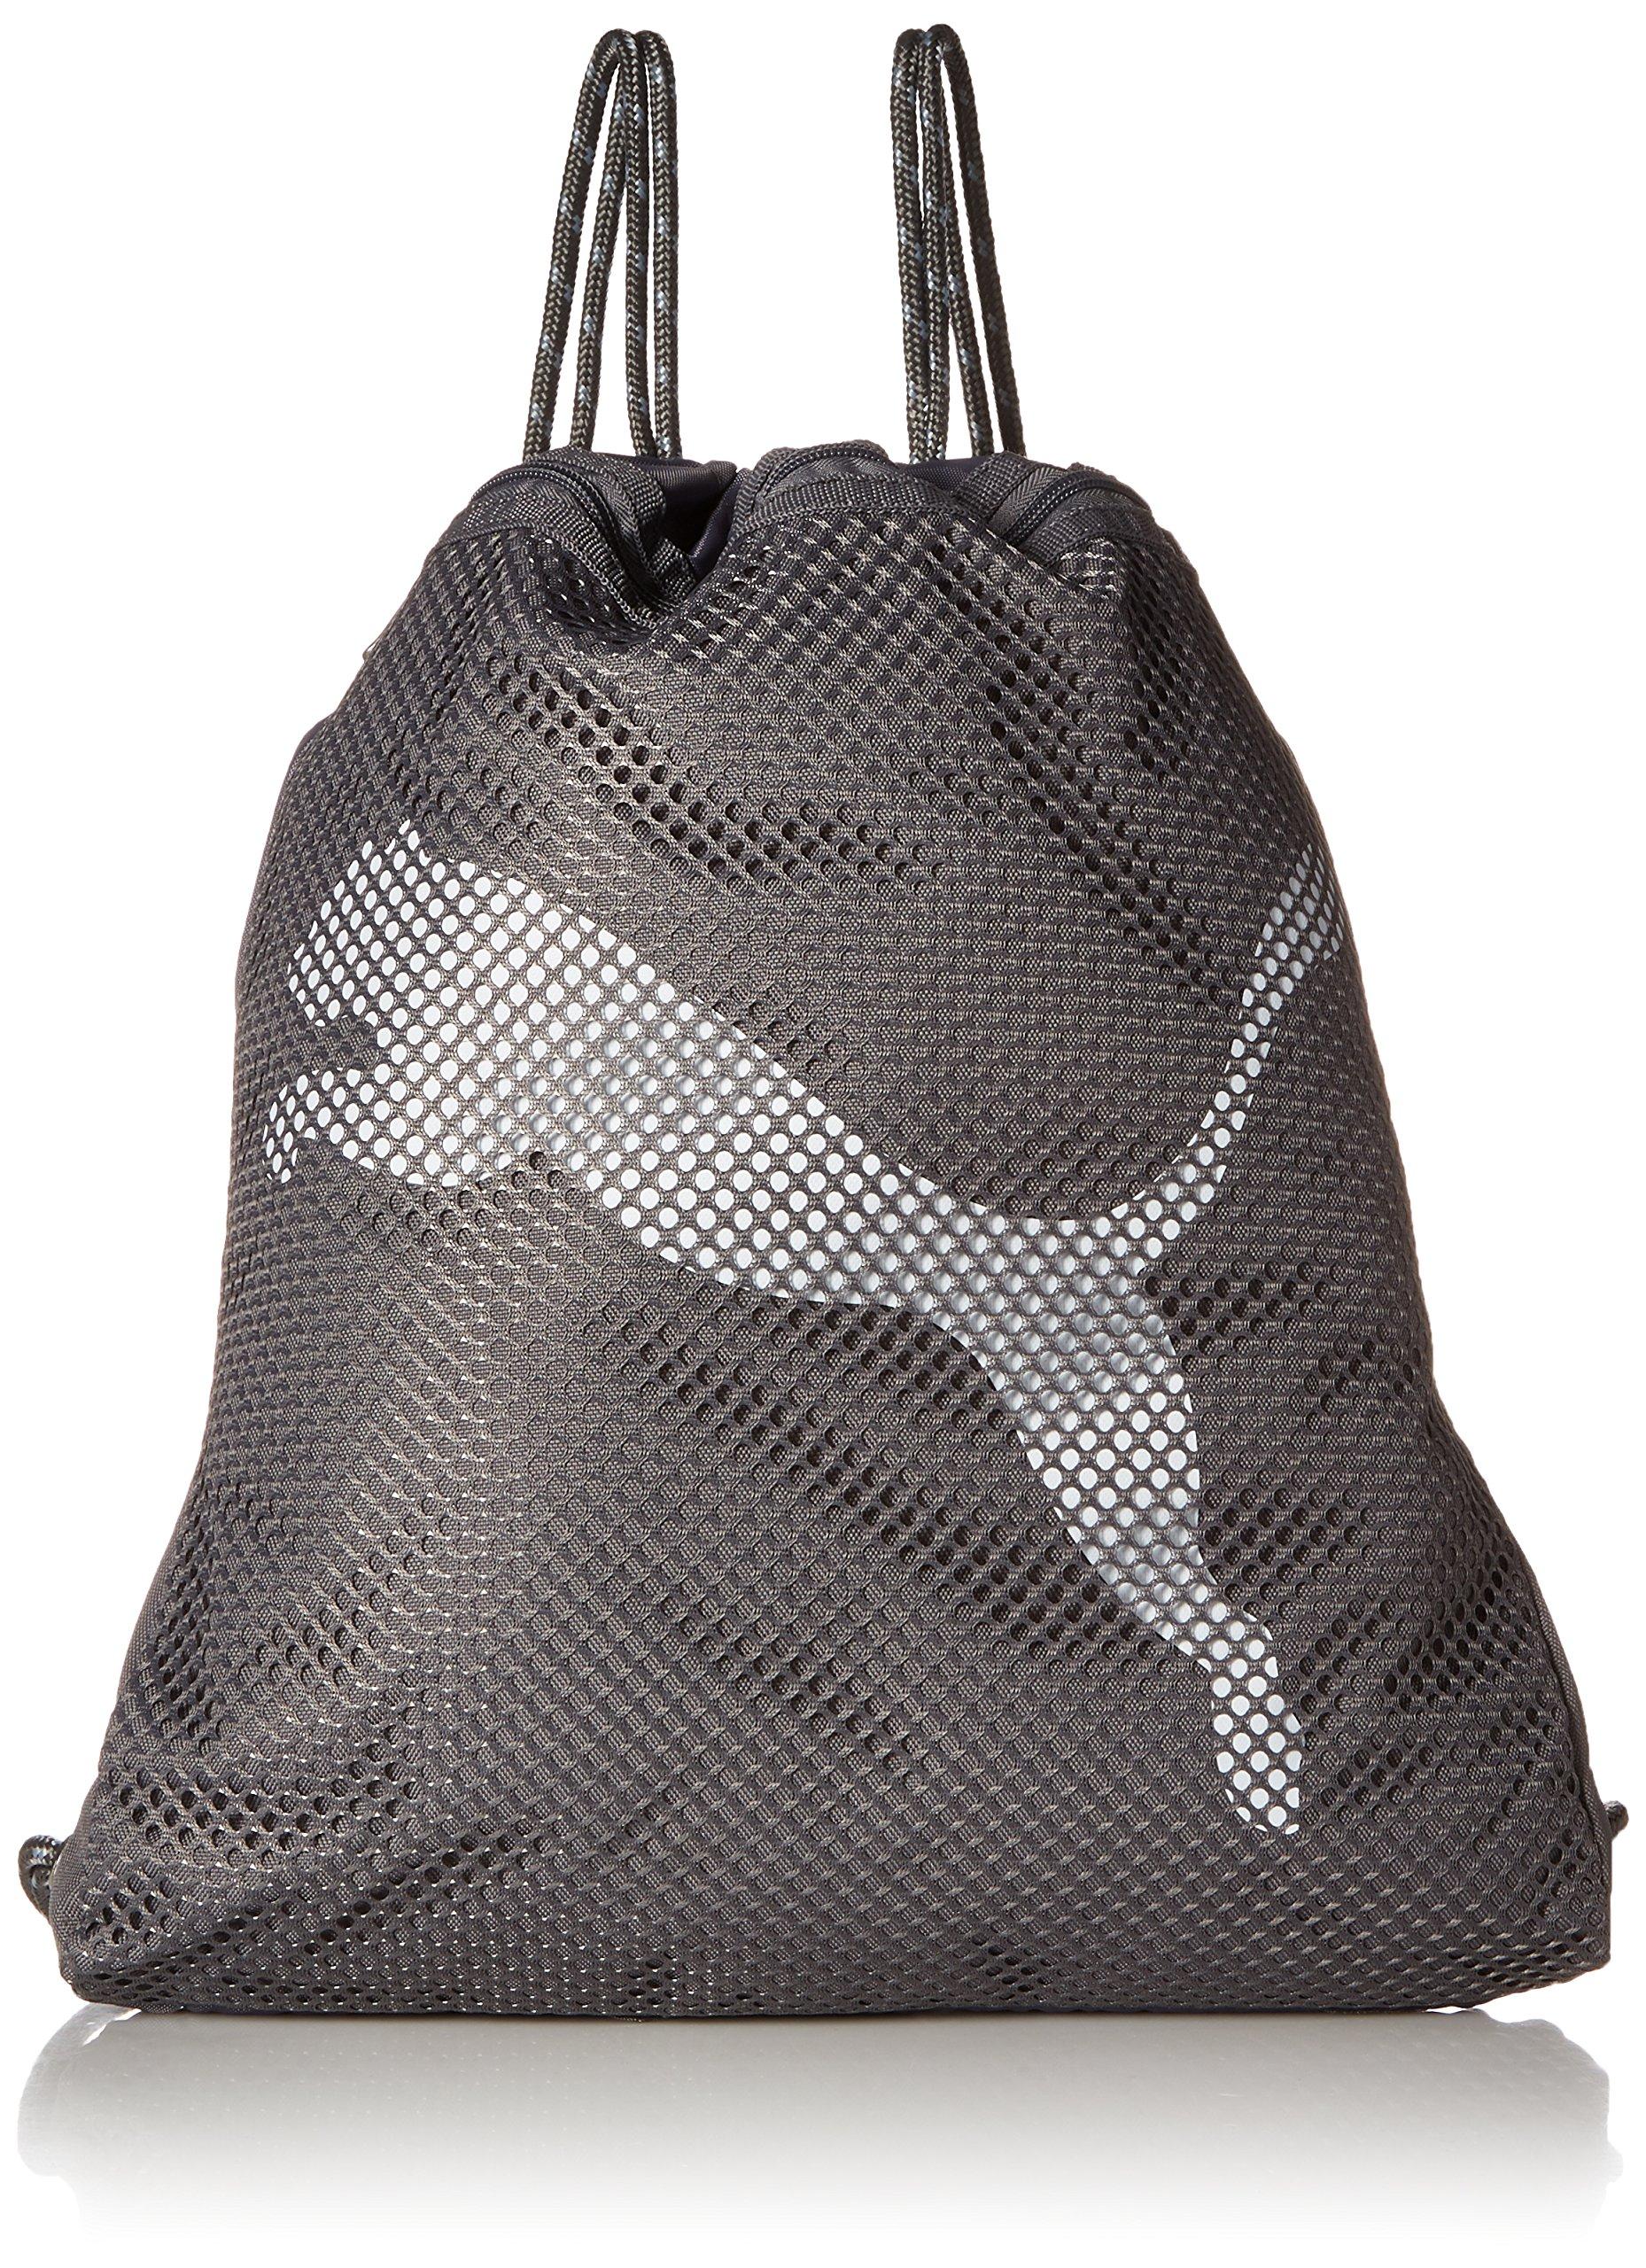 PUMA Women's Evercat Revive Carrysack, Gray, One Size